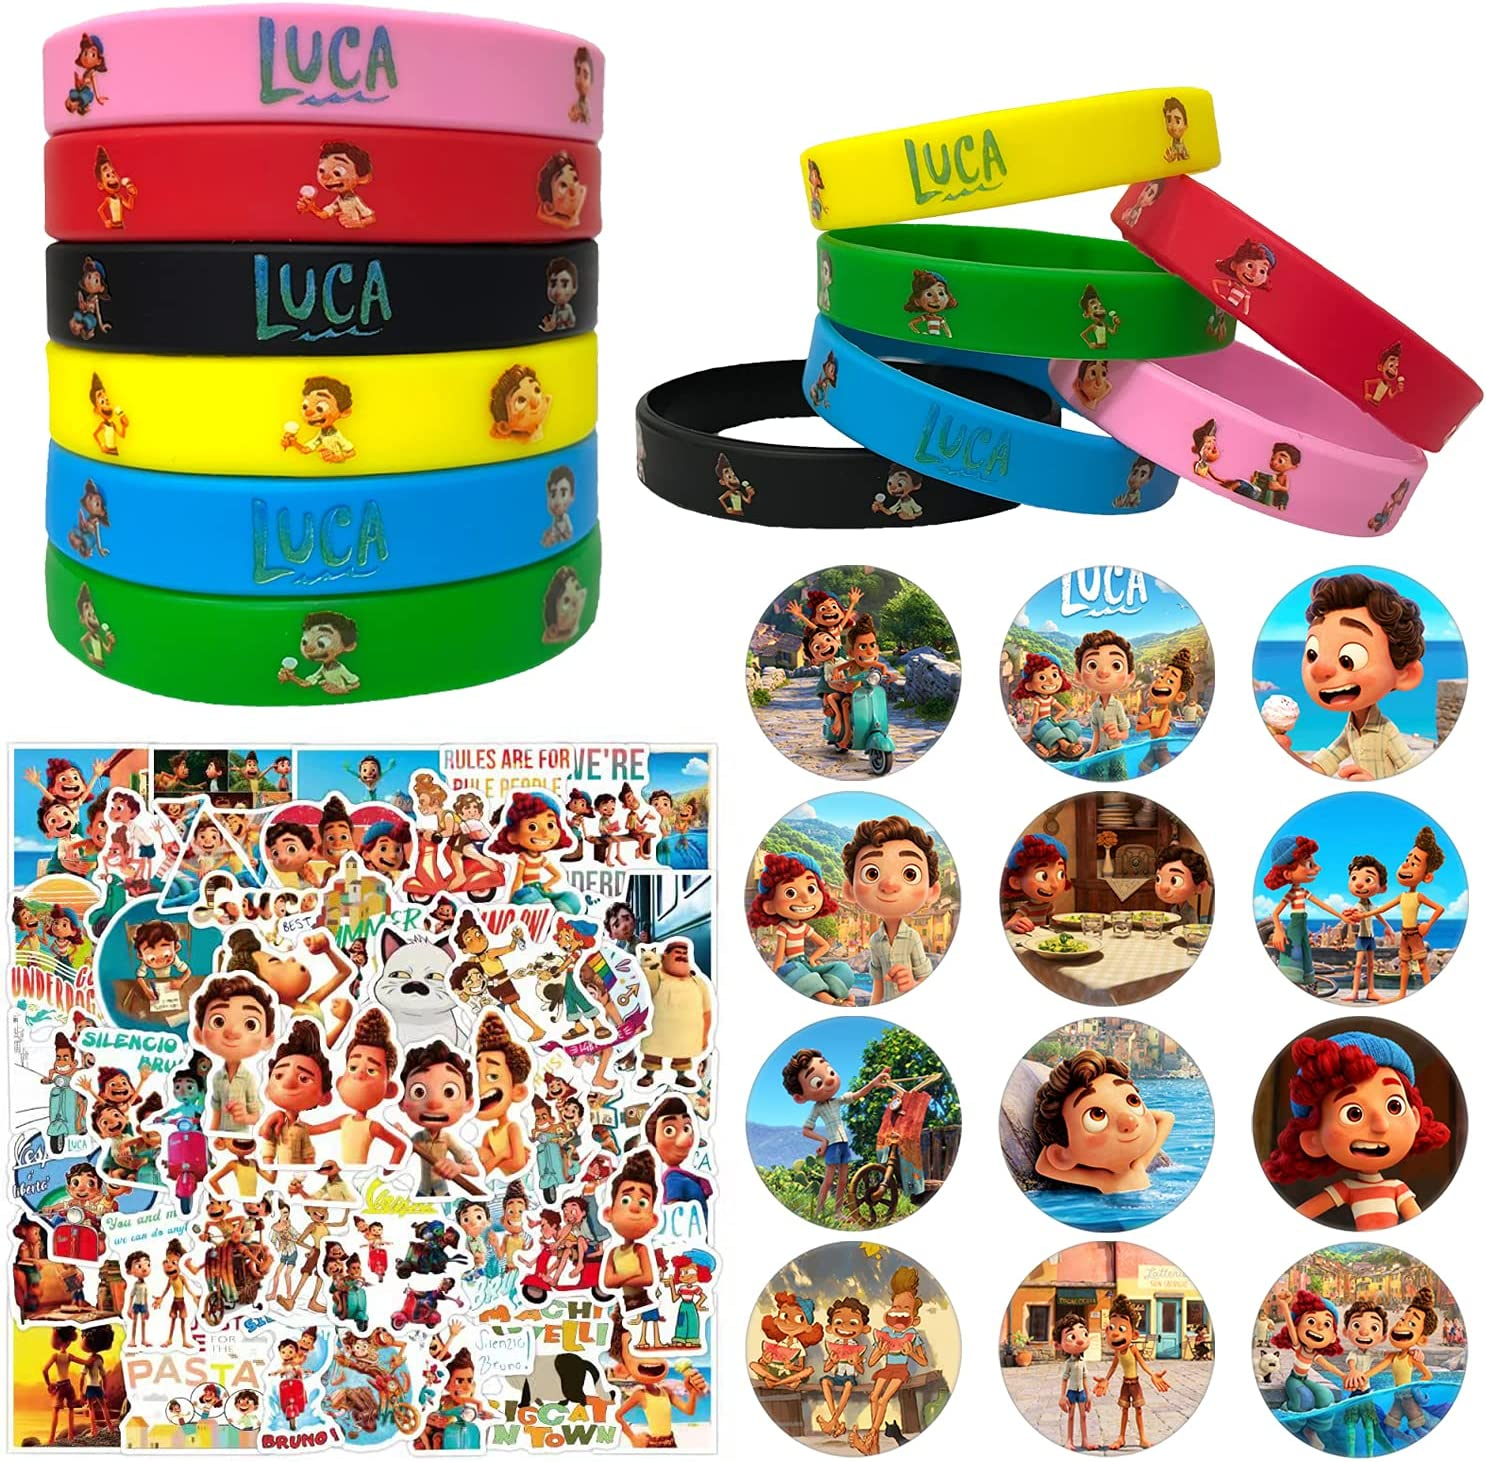 DISAPAK Luca Birthday Party Favors Free Shipping Cheap Bargain Over item handling ☆ Gift Par for Kids Pack 74